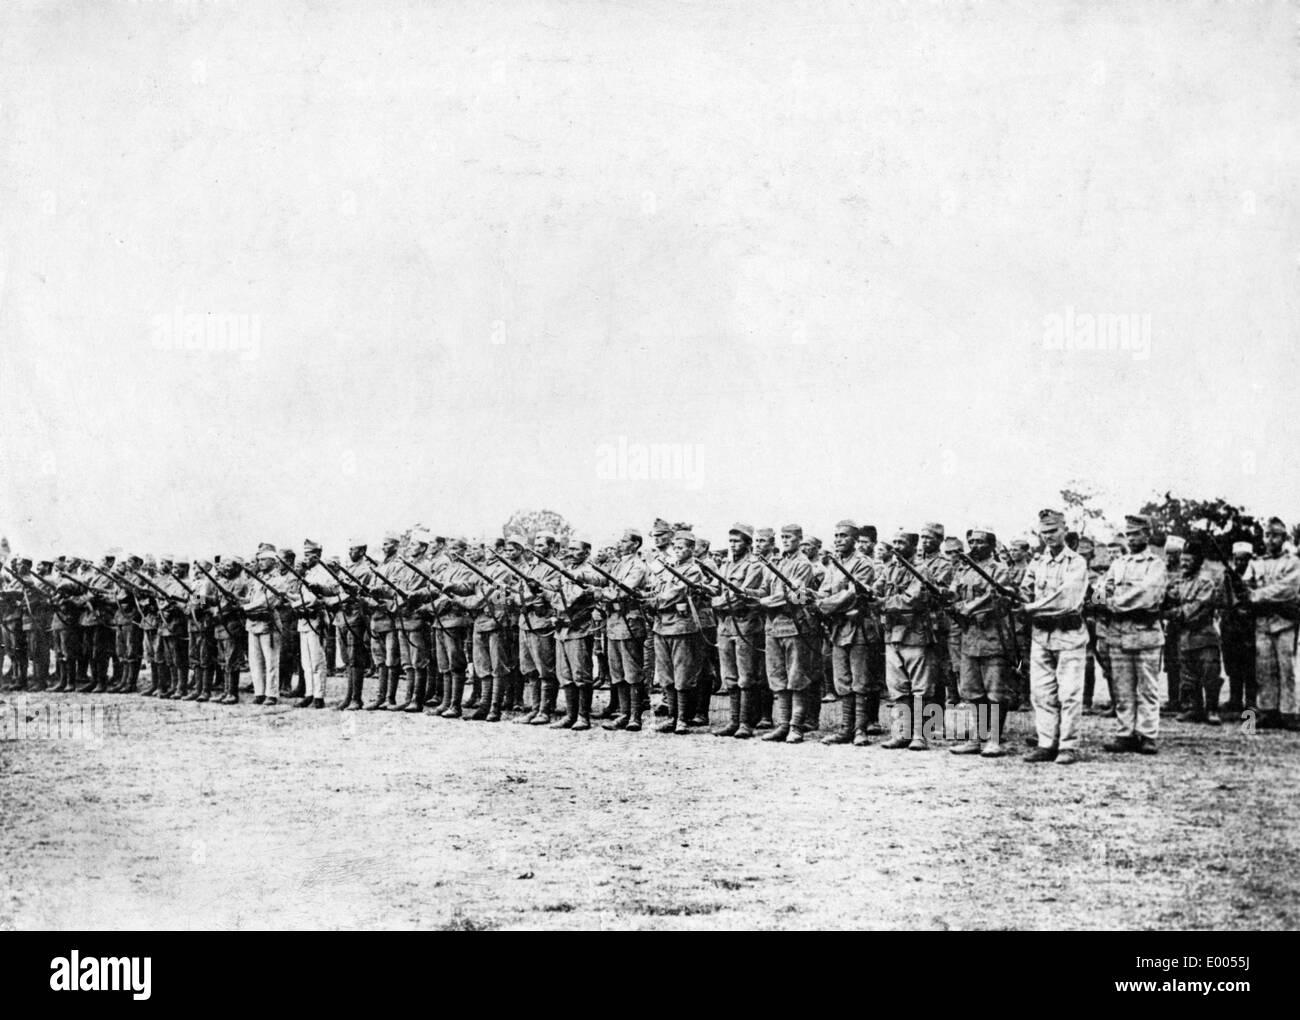 Albanian Volunteers Company in Tirana, 1917 - Stock Image